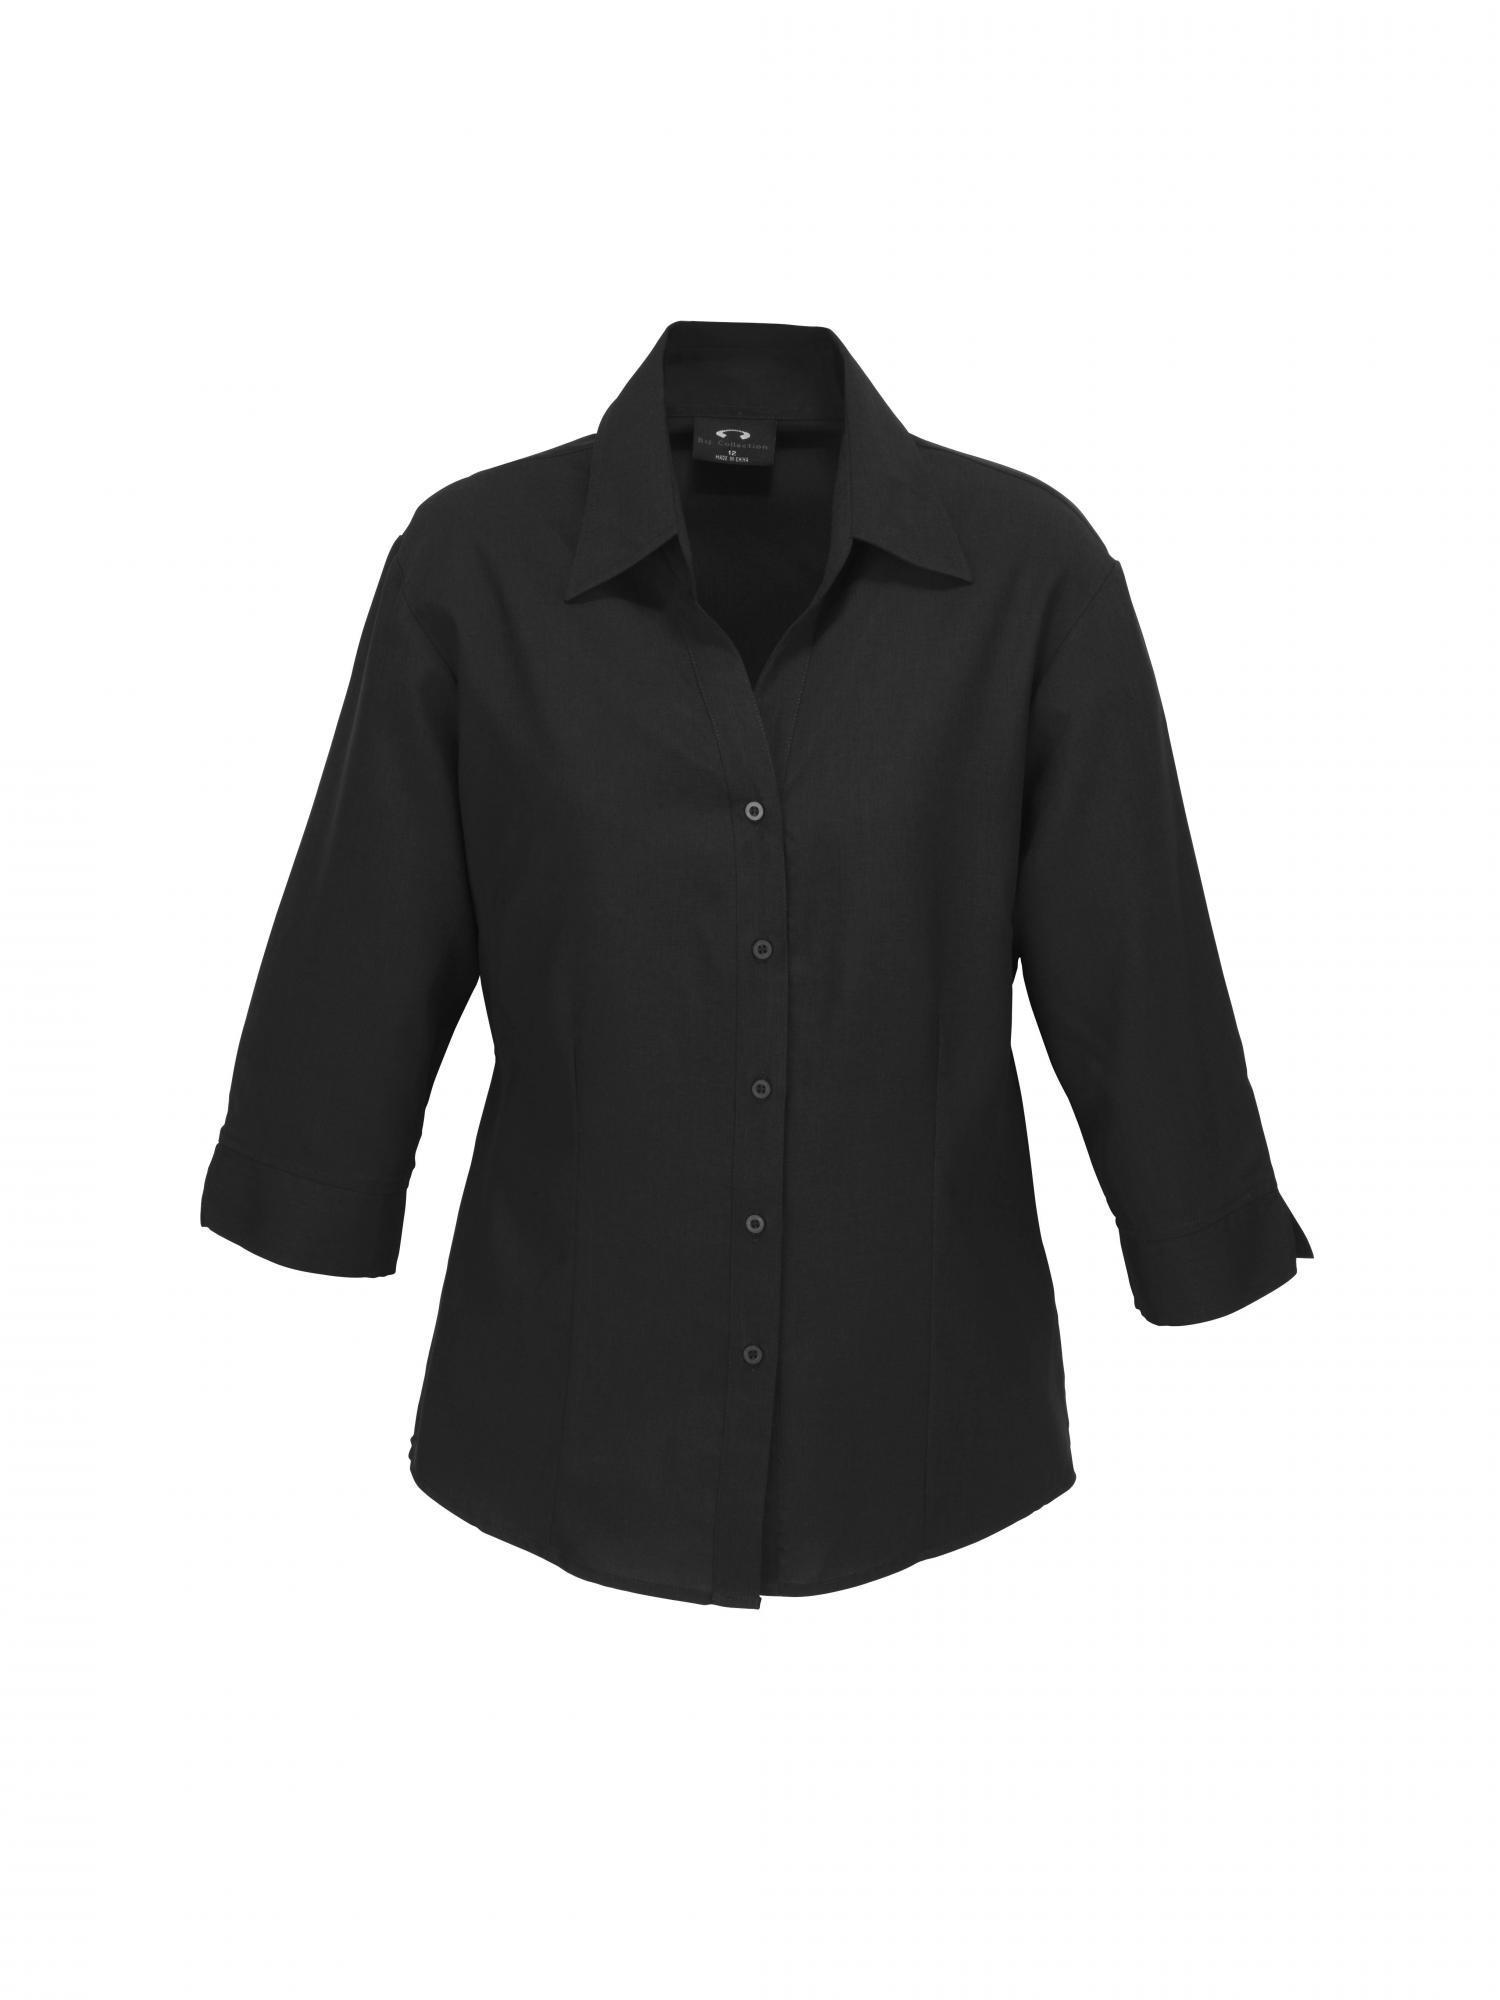 ladies plain black t shirt - photo #26